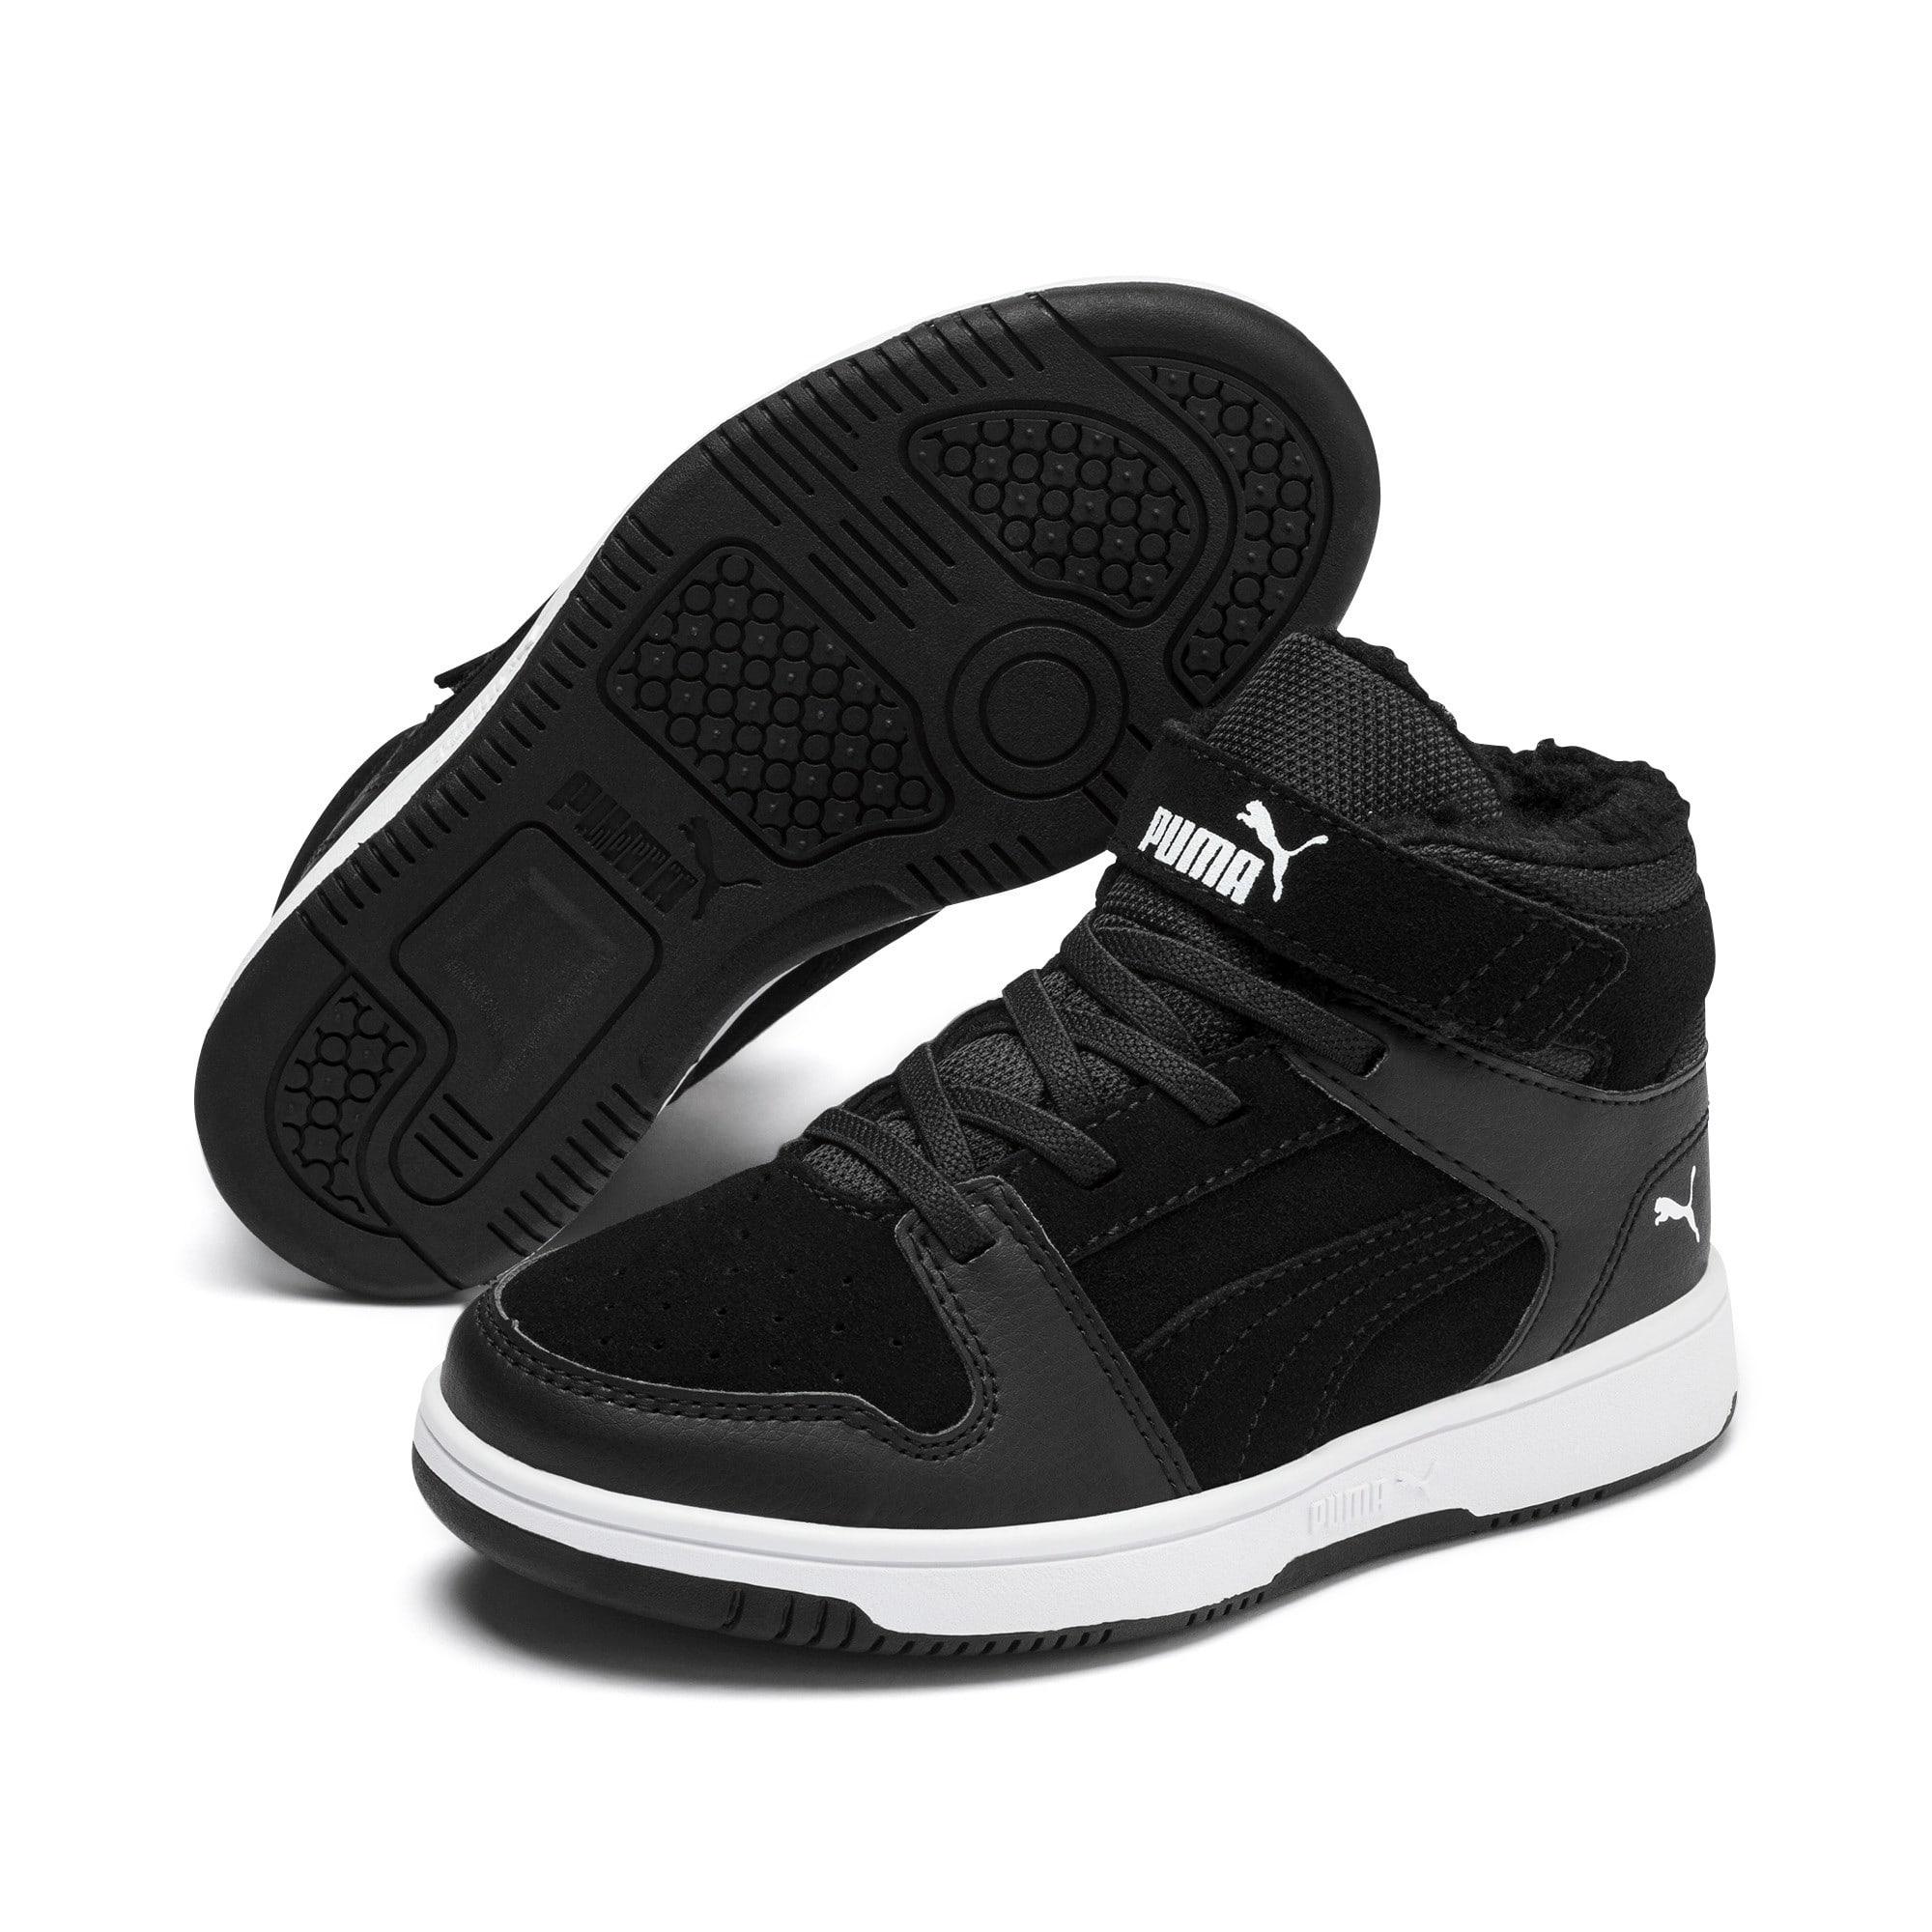 Thumbnail 2 of Rebound Lay-Up Fur V Kids Sneaker, Puma Black-Puma White, medium